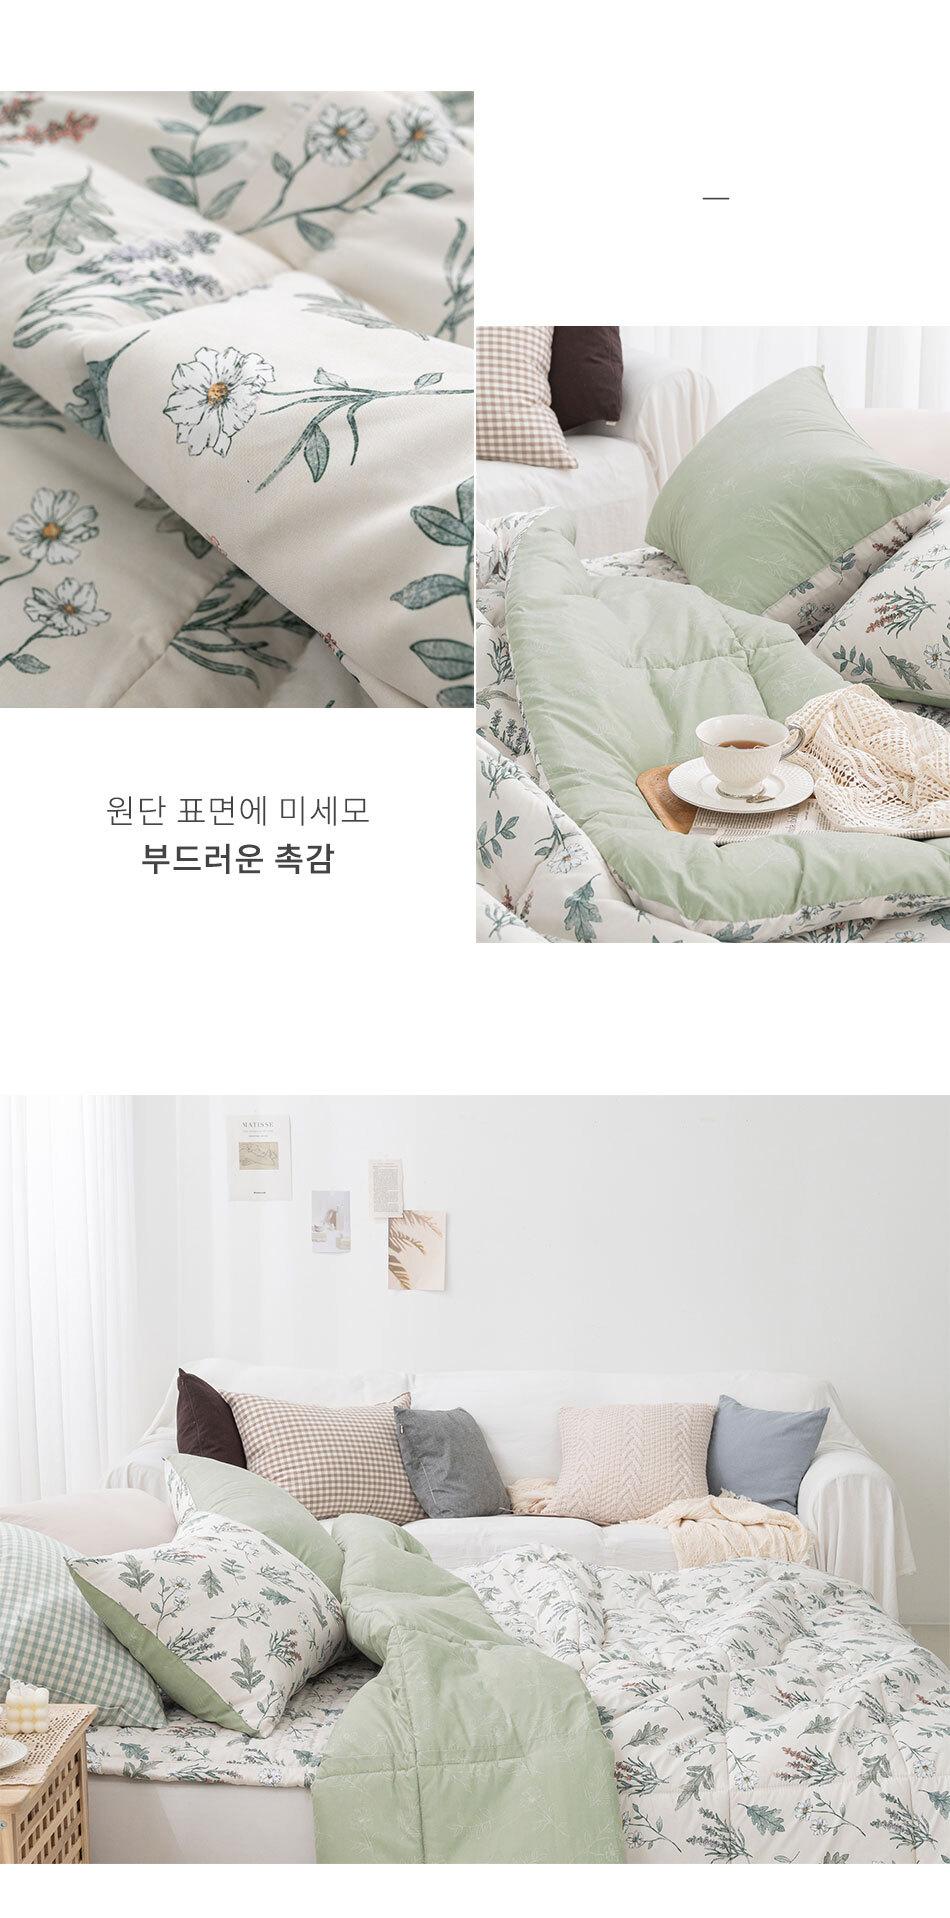 marguerite_bed_03.jpg